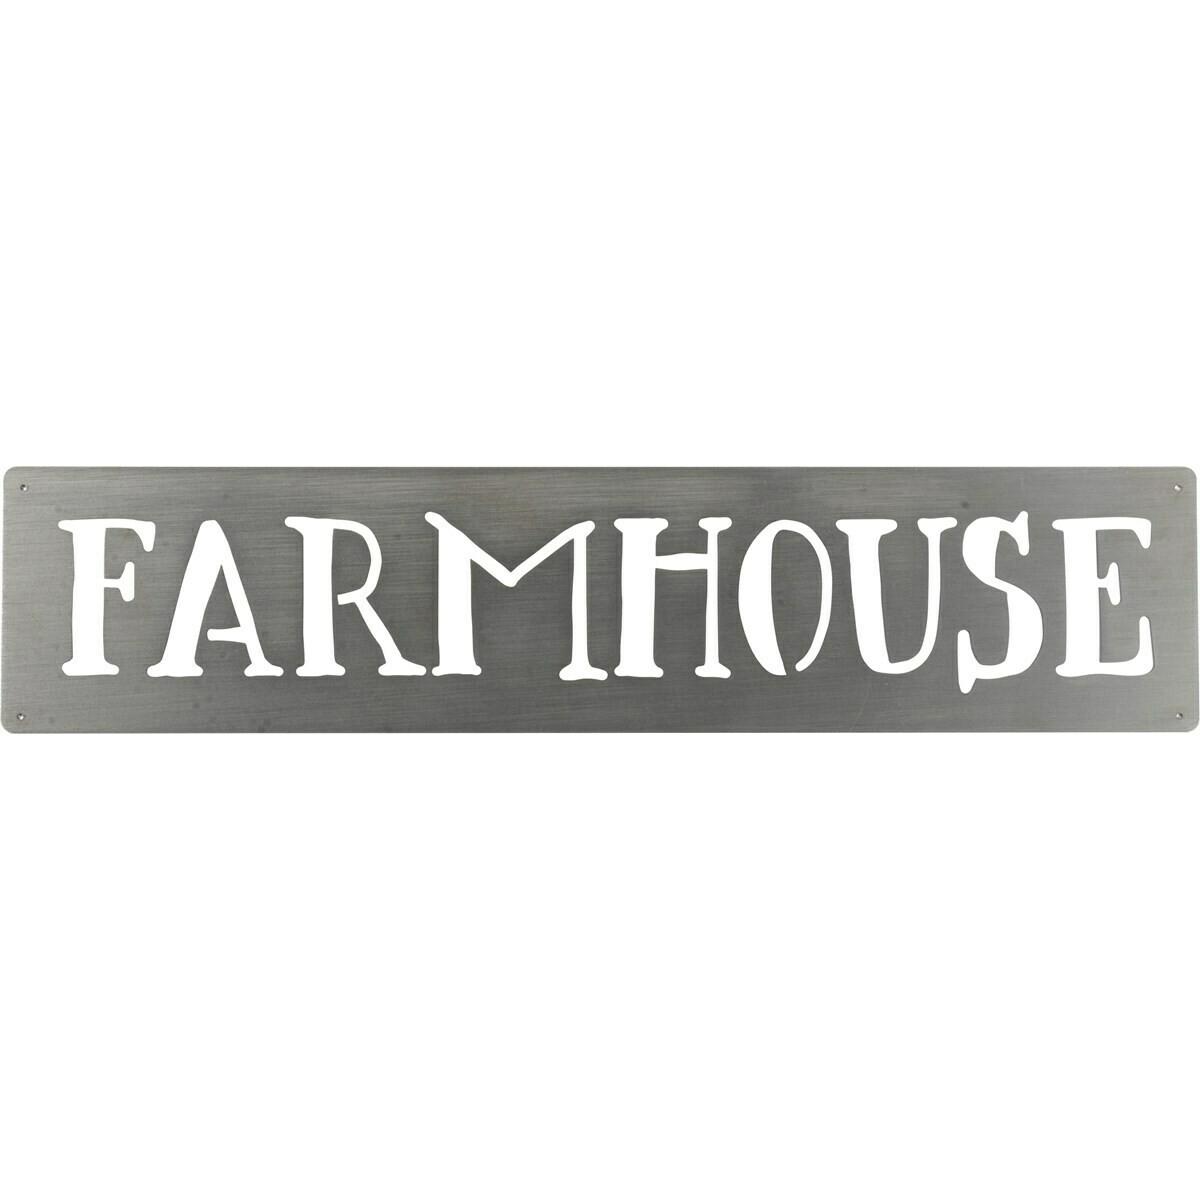 Farmhouse Metal Wall sign